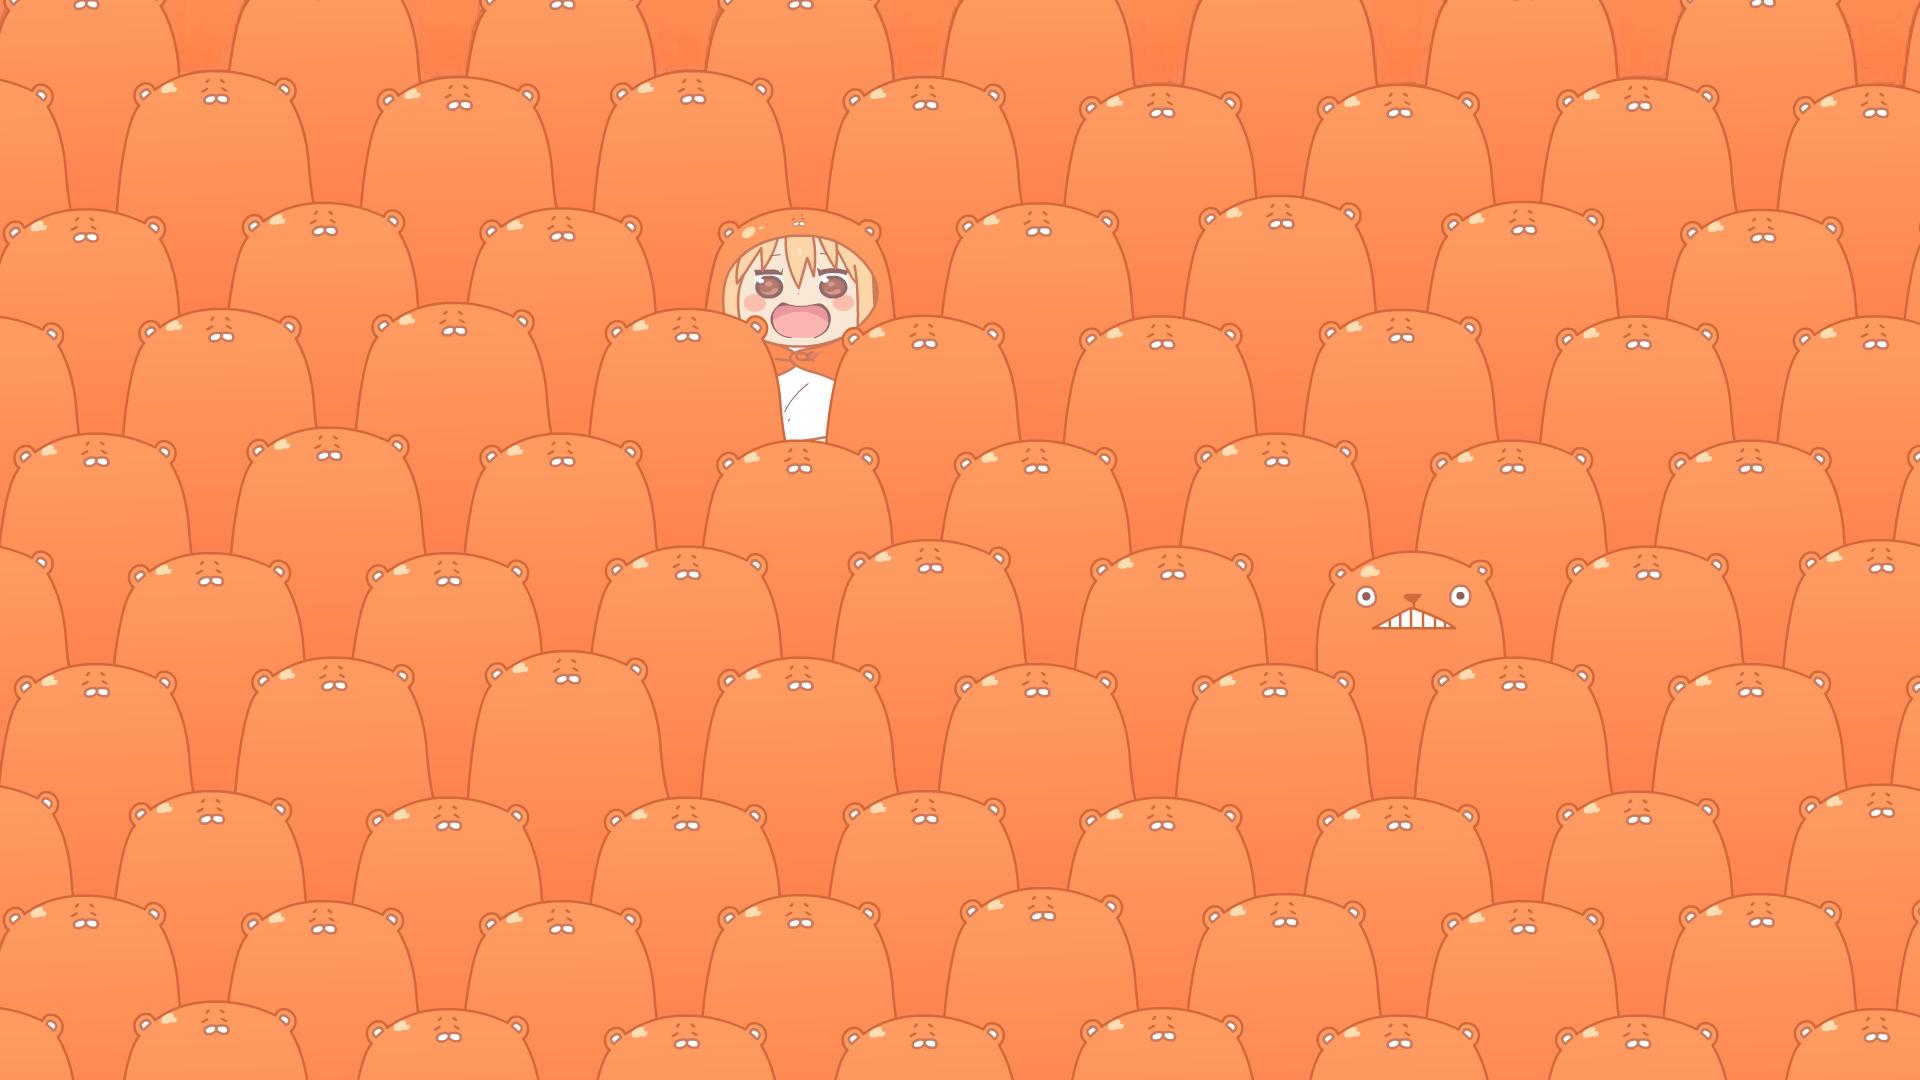 Free Download Anime Himouto Umaru Chan Umaru Doma Wallpaper